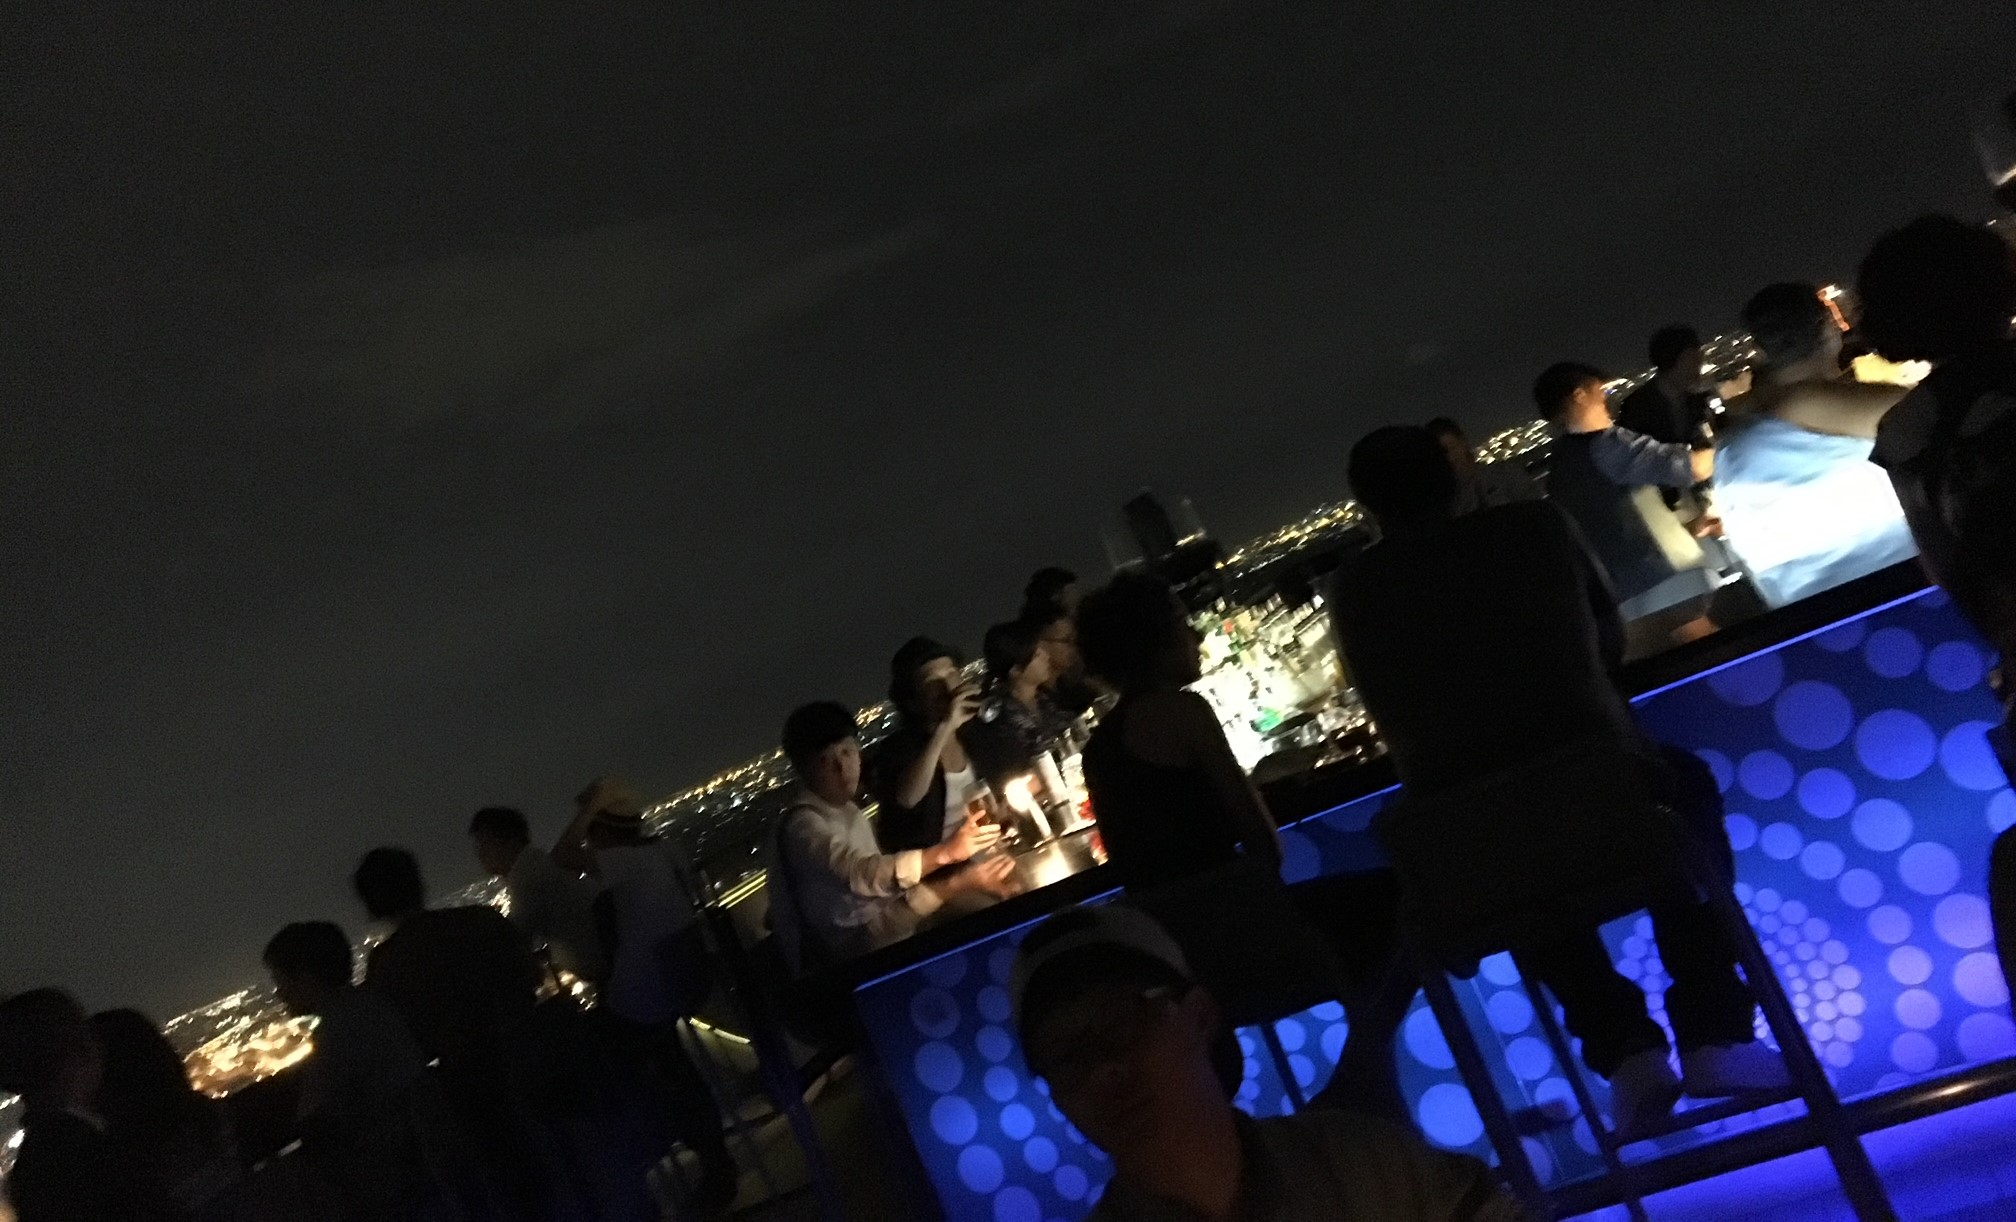 MOONBARの夜の雰囲気の画像